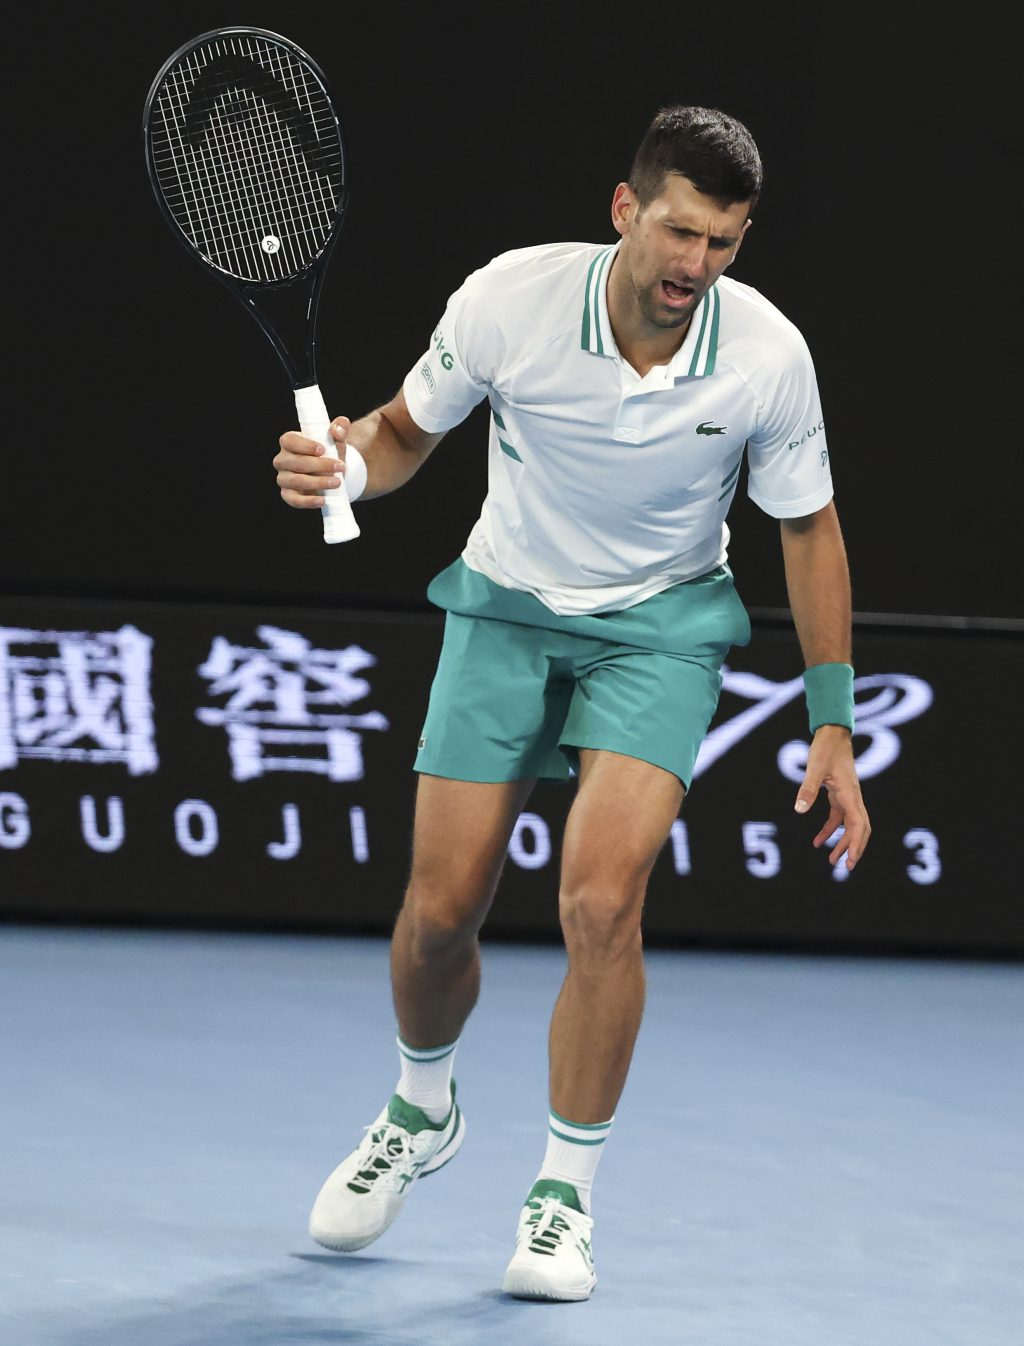 Novak Djokovic in discomfort